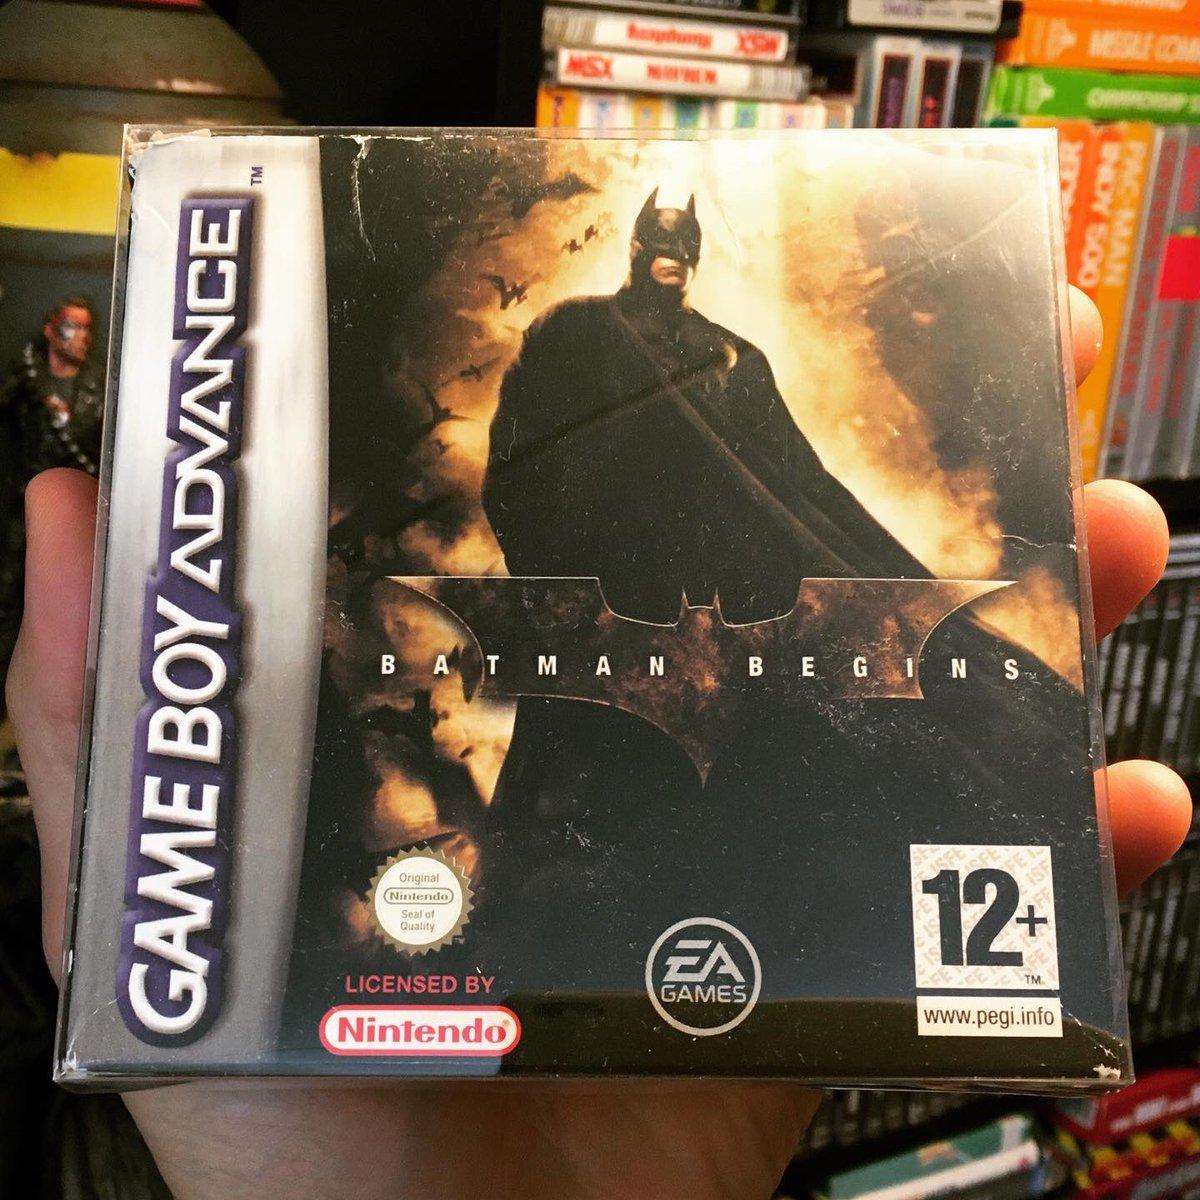 Batman Begins - Vicarious Visions - GBA Platform Stealth Action Game - 2005 #retrogaming #retrogames #retrogamer #platformgame #gamer #gaming #batmanbegins #vicariusvisions #popculture #nintendogames #gba #gameboyadvance #gameroom   #consolegames #nintendo #videogamespic.twitter.com/jLsqAtKNmM